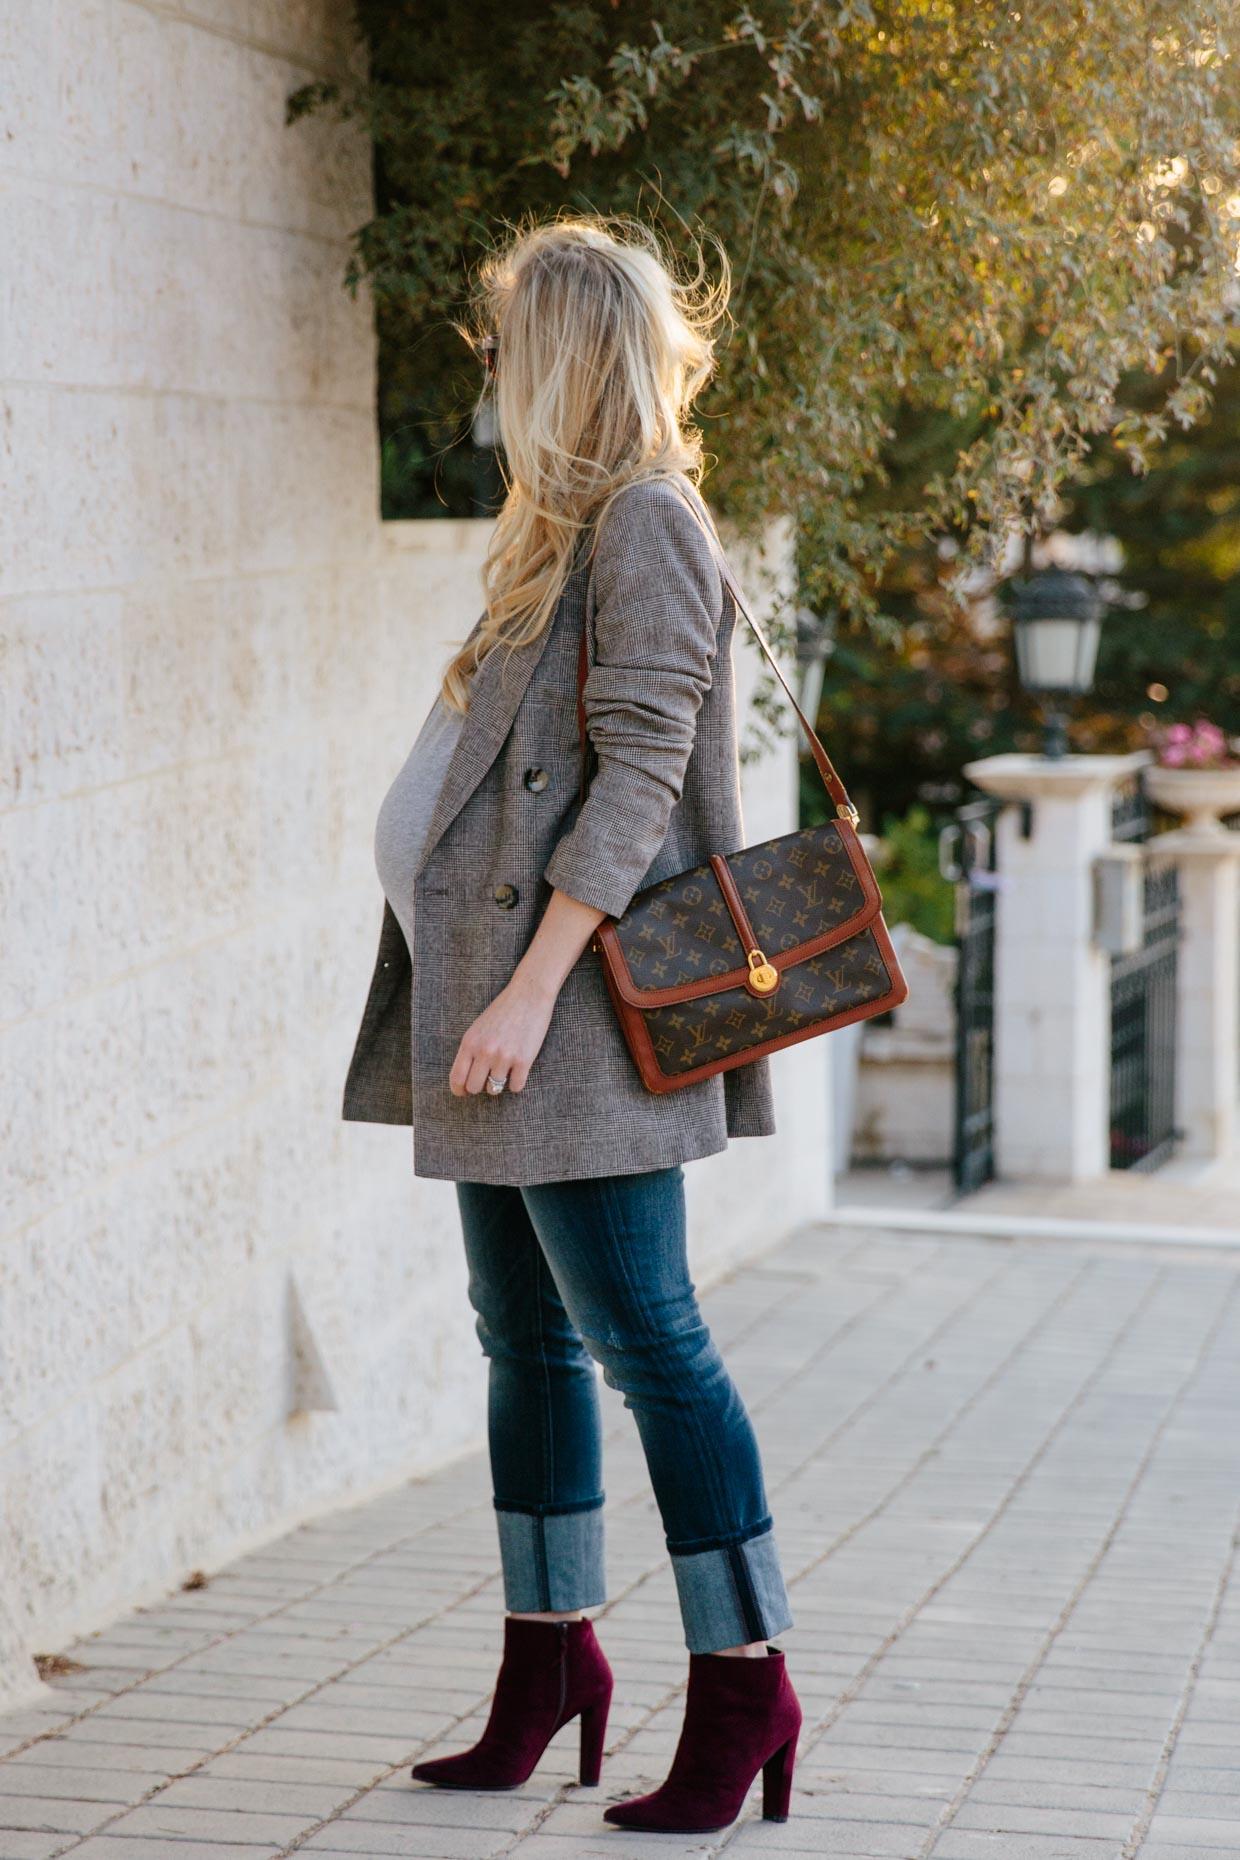 Louis Vuitton Denim Bag >> Fall Plaid: Menswear Blazer with Wide Cuff Jeans & Booties ...